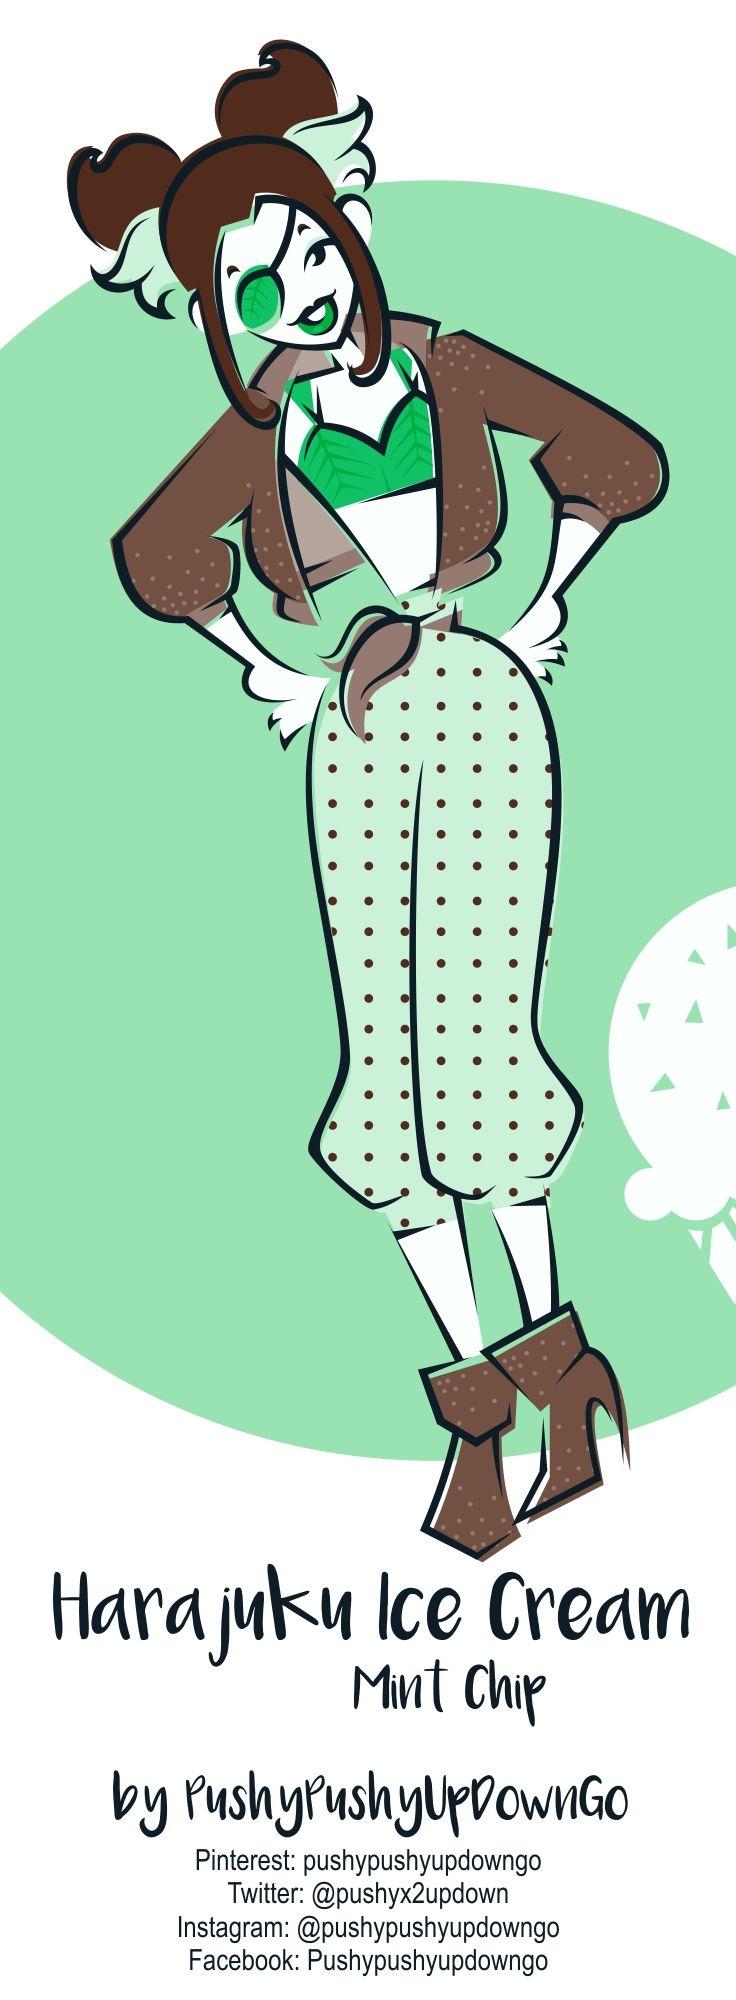 From my Harajuku Ice Cream kawaii fashion illustration series (available as part of a 8-piece postcard art print set)